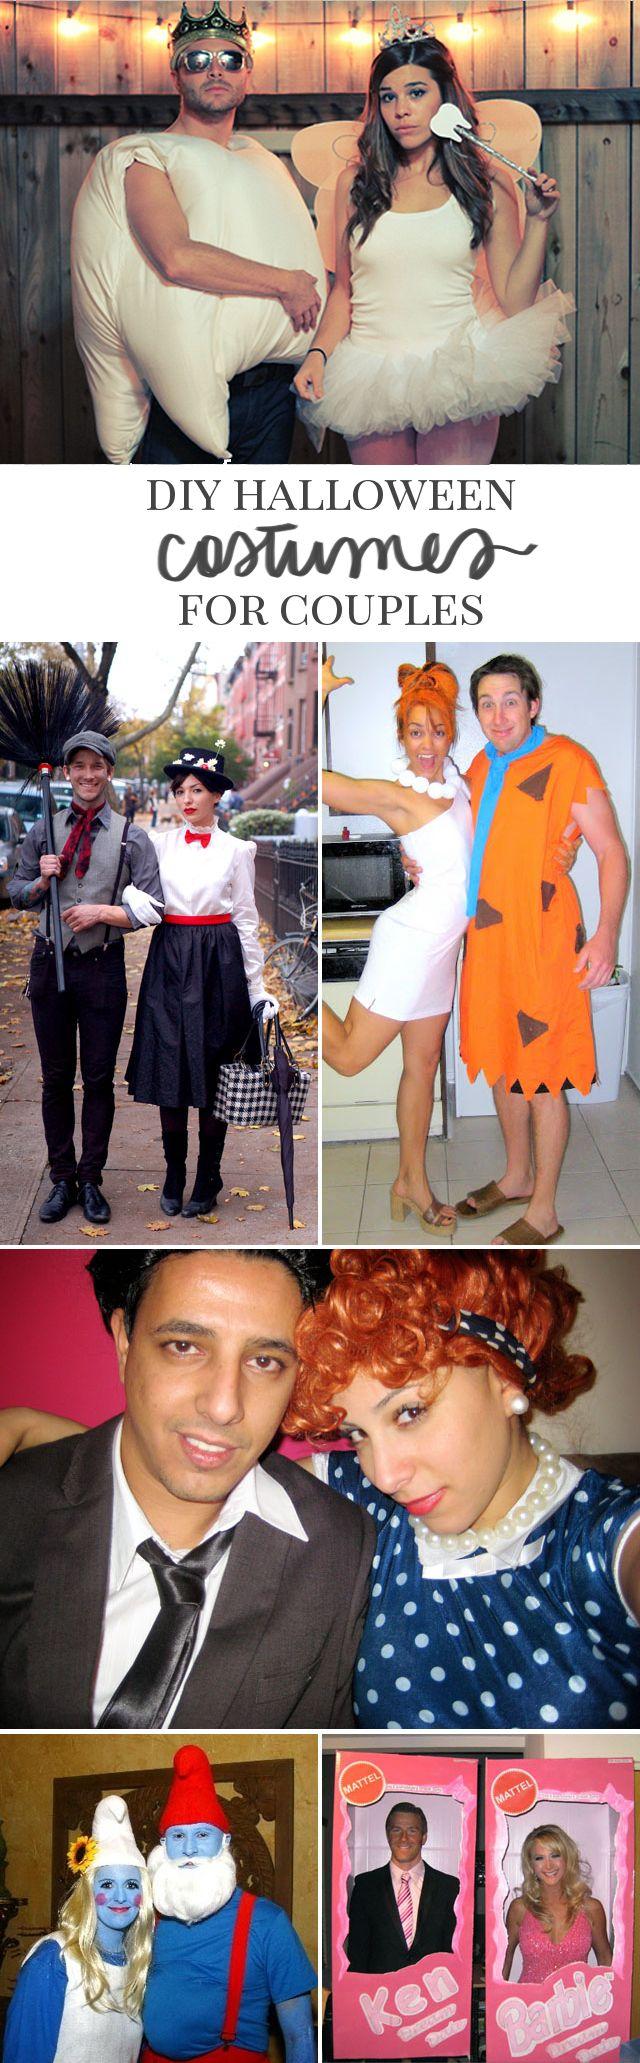 #halloween #tutorial #costumes #couples #costume #couple